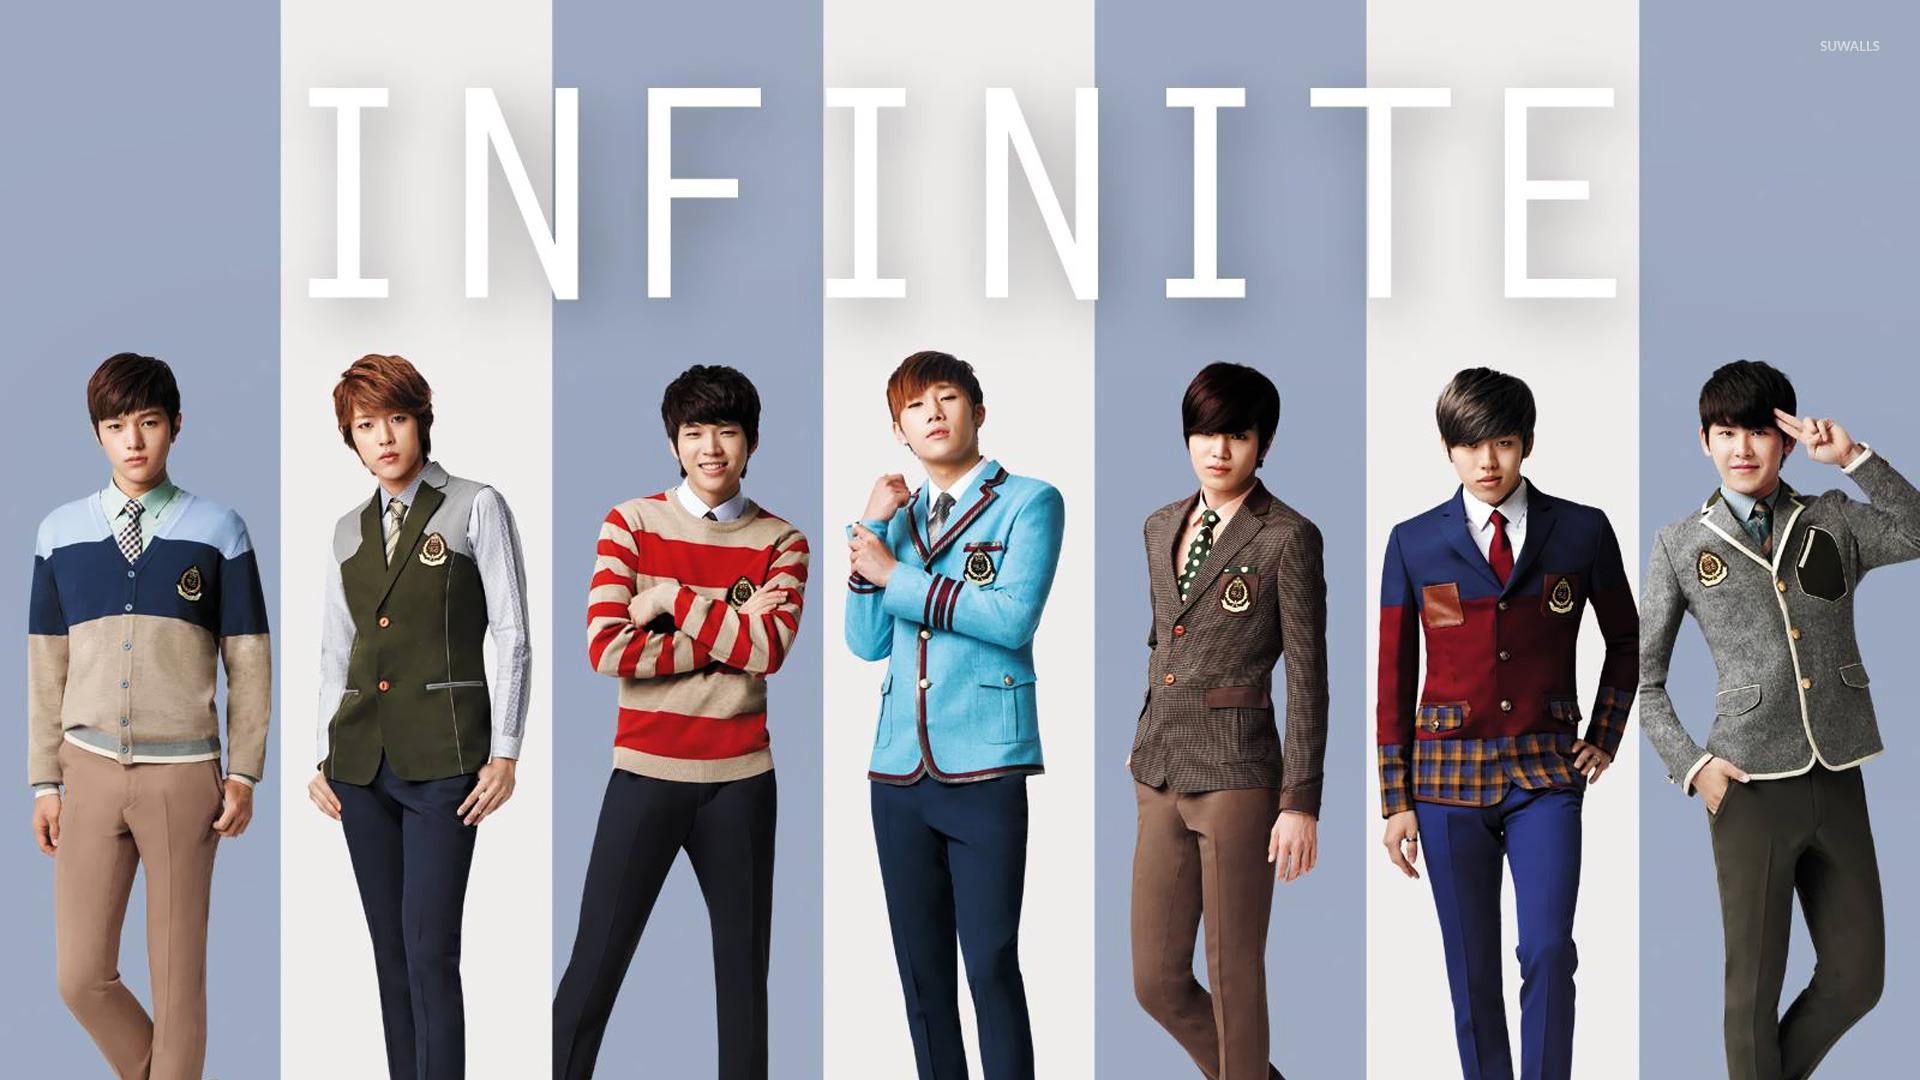 infinite hd